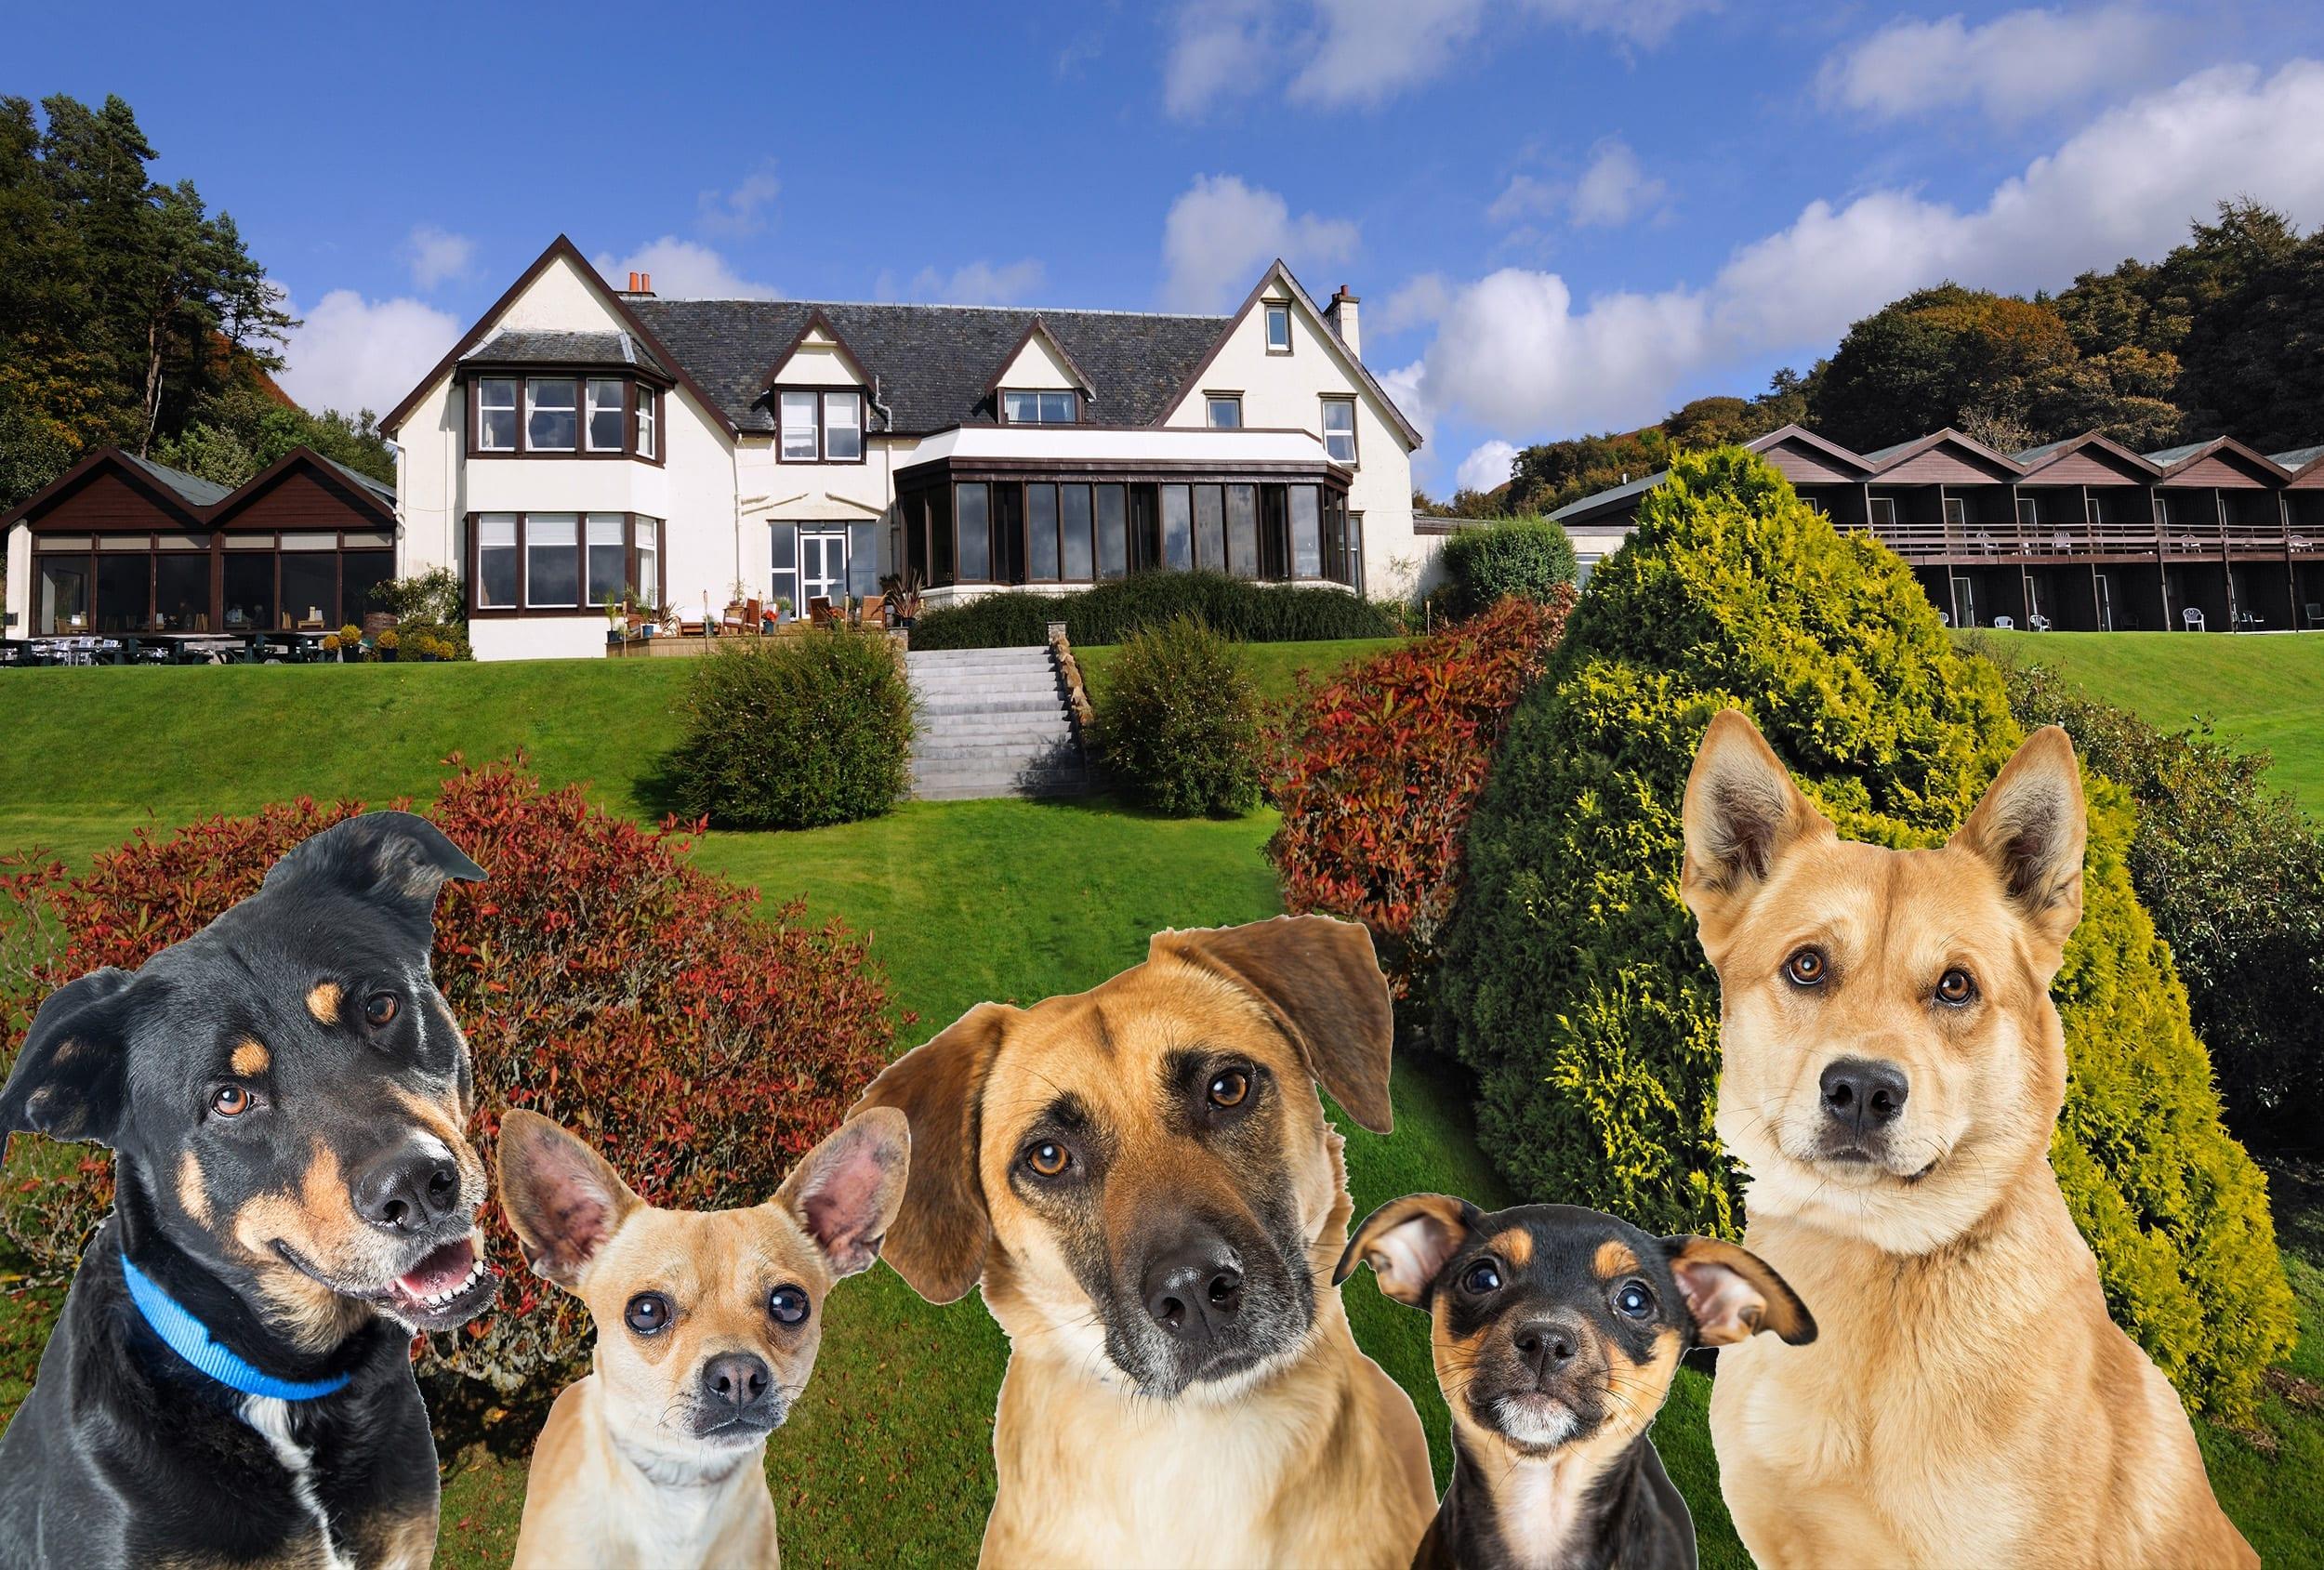 Dog Friendly March at Loch Melfort